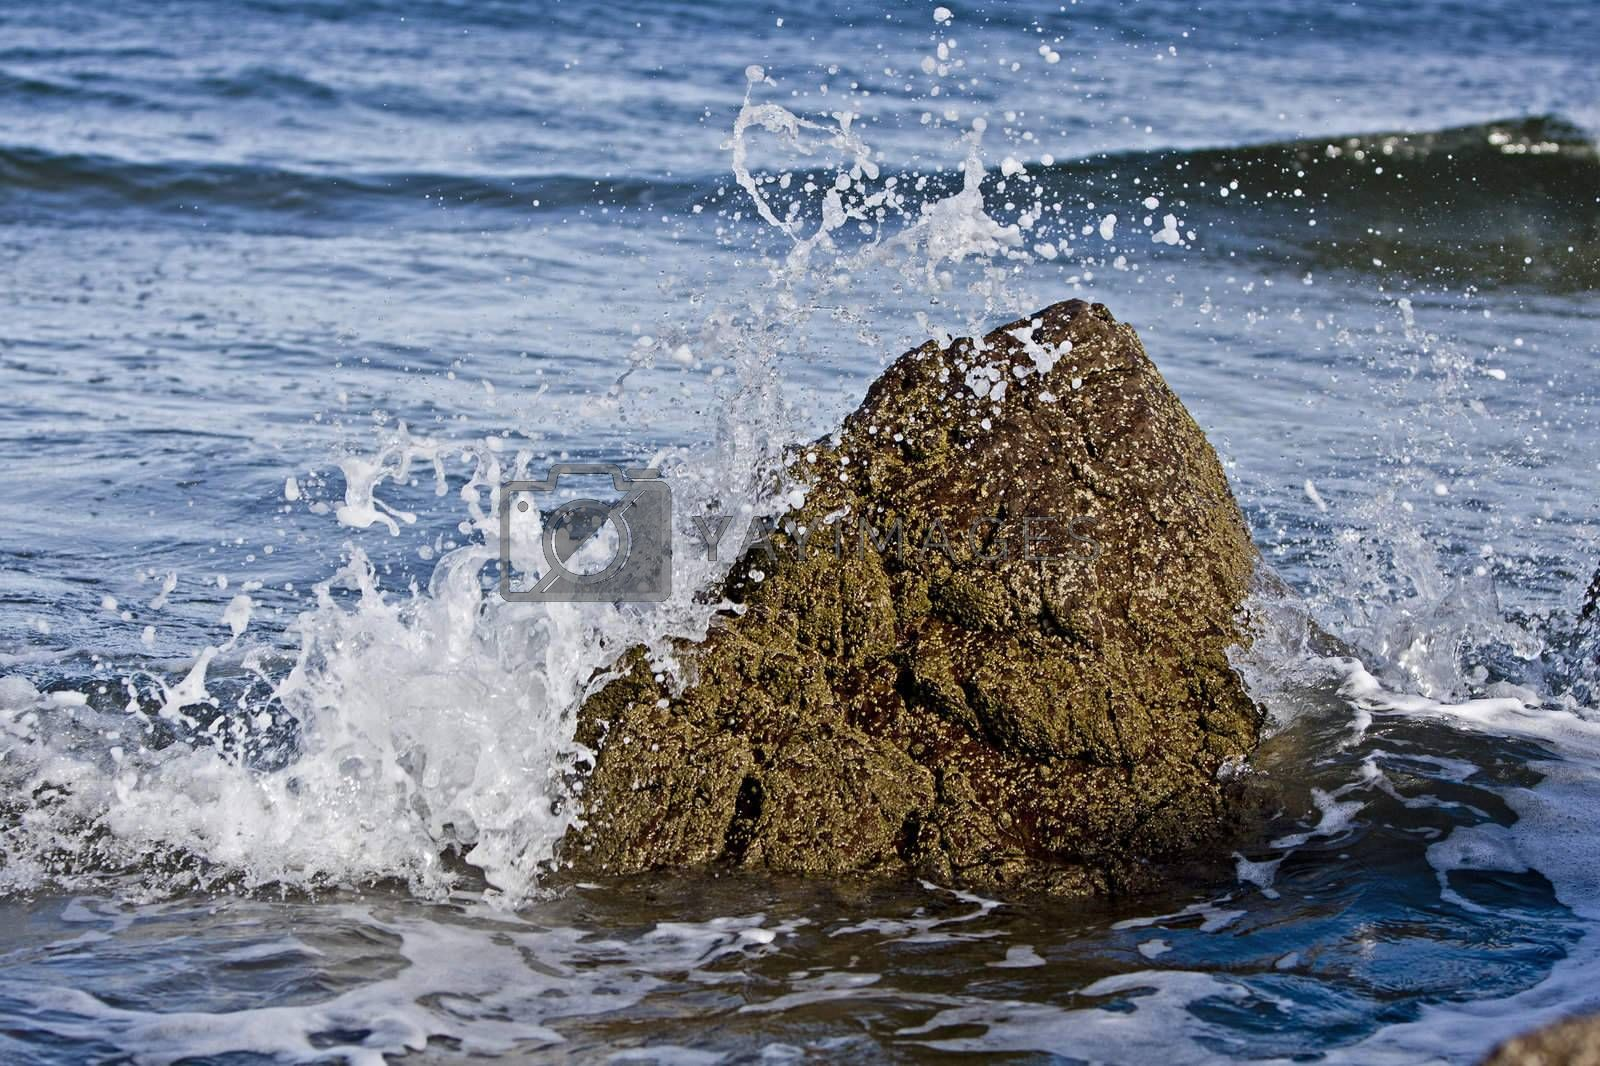 small rock resisting the wave of the atlantic ocean. Scotland, UK